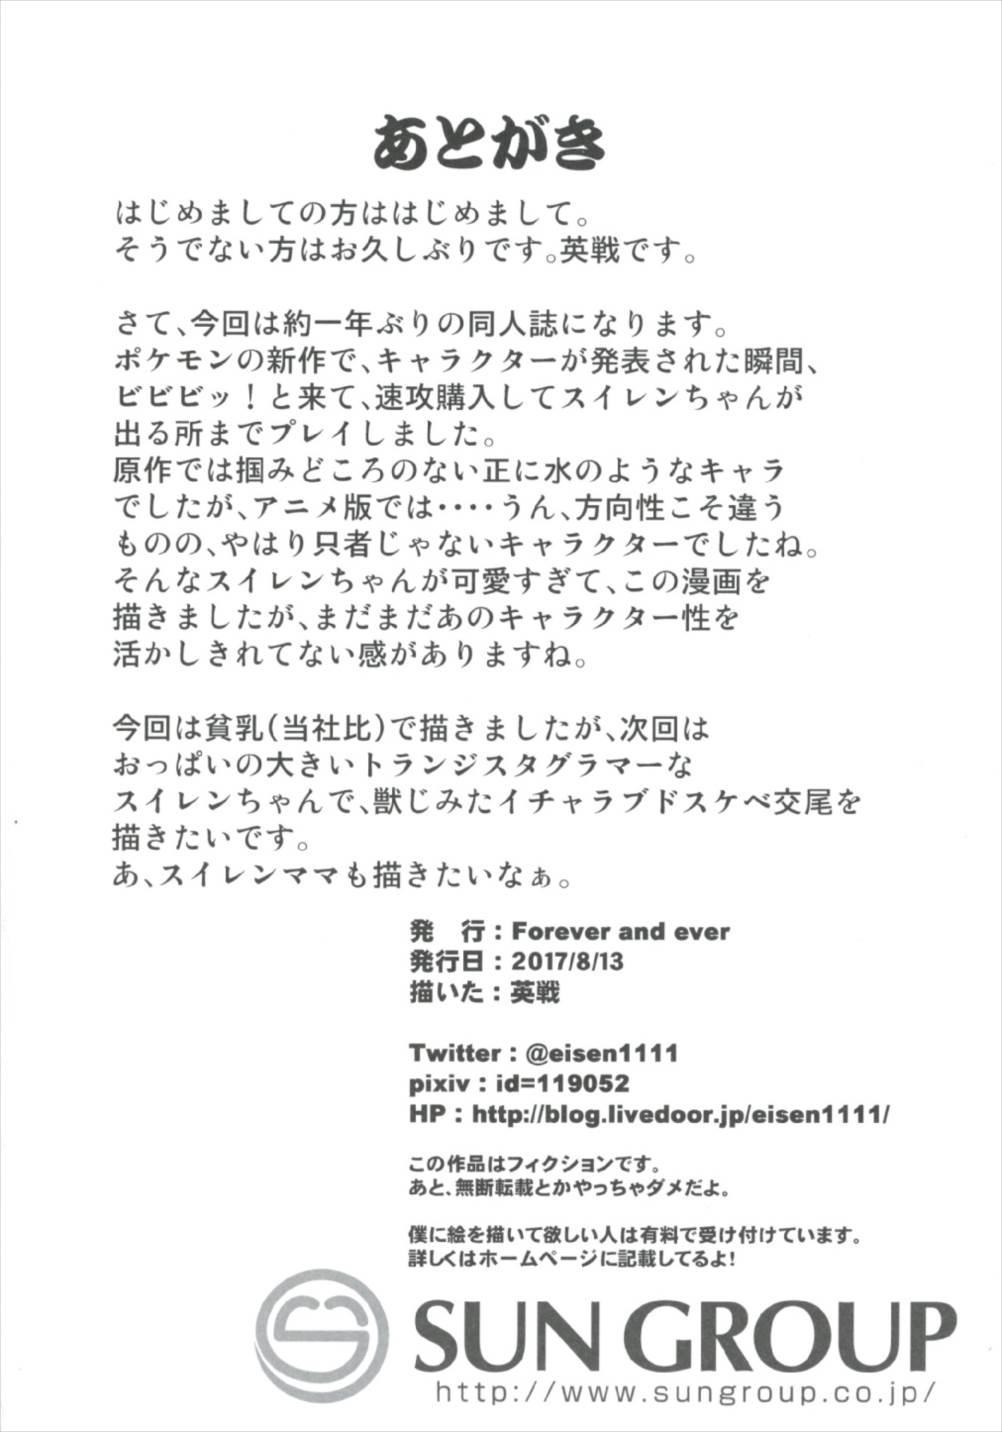 (C92) [Forever and ever (Eisen)] BOKKIMON -Suiren-chan wa H ni Kyoumi Shinshin- (Pokémon Sun and Moon) 31